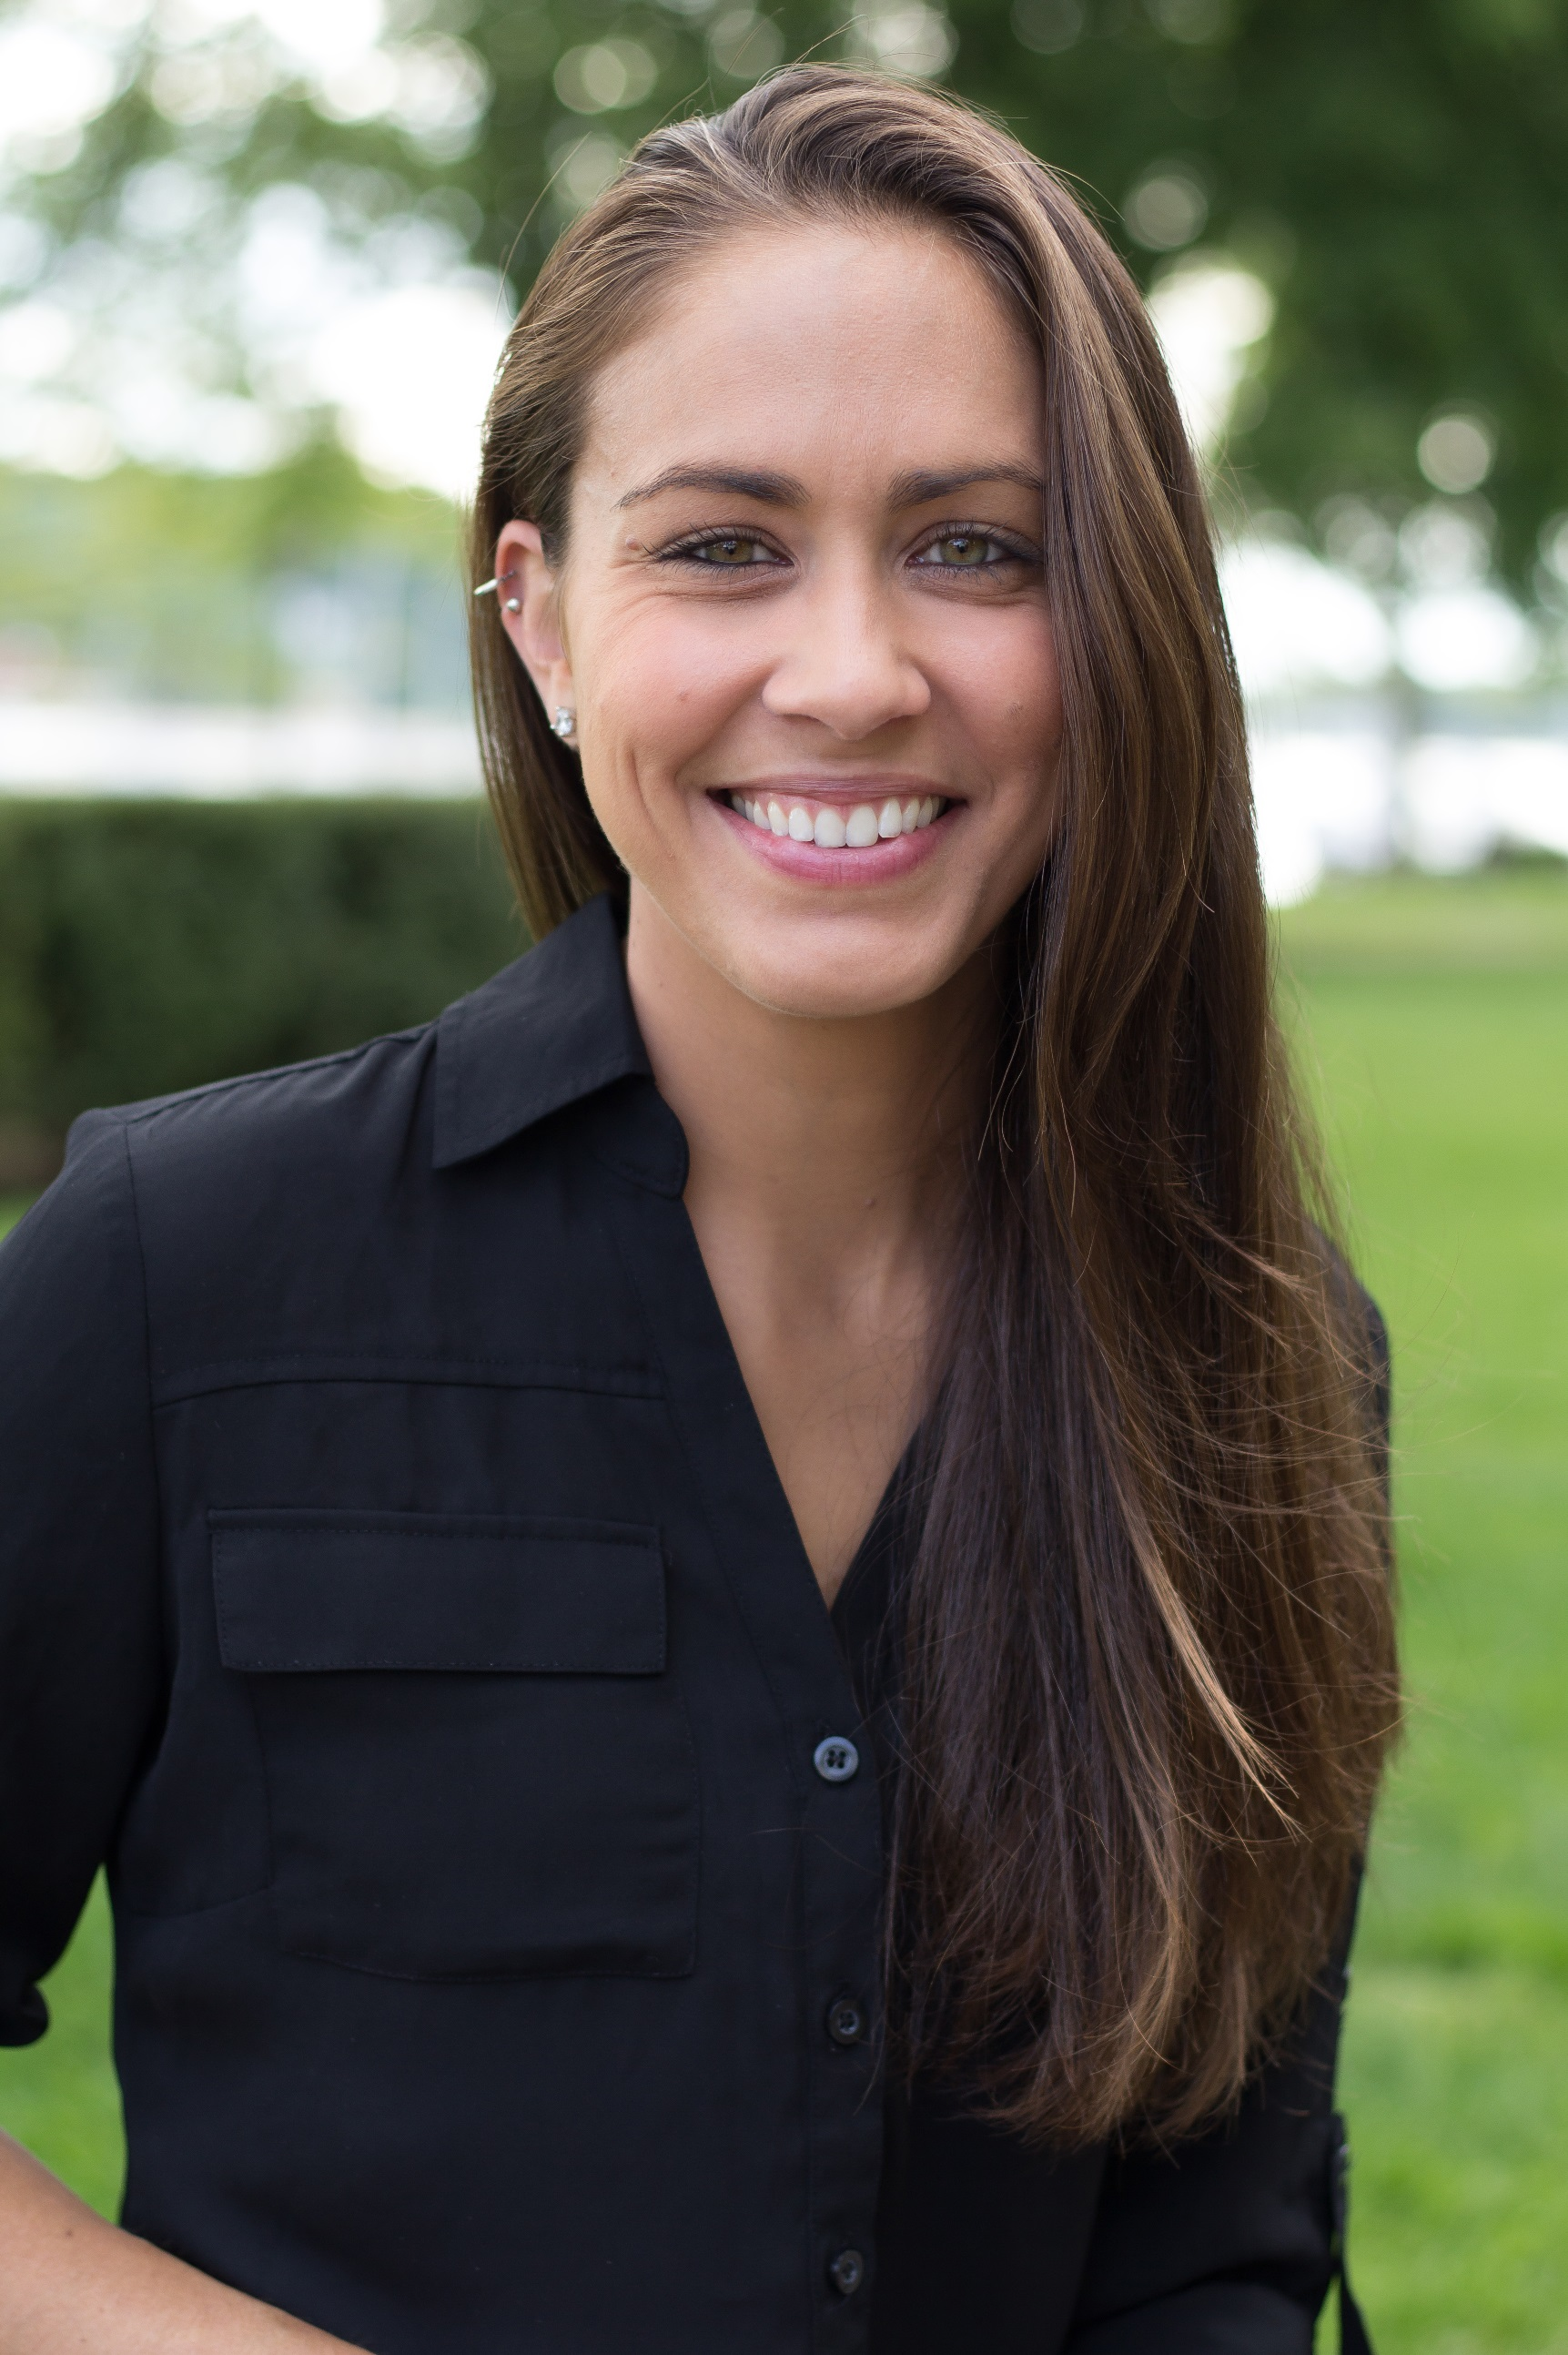 Jessica Capozzola- Photographer